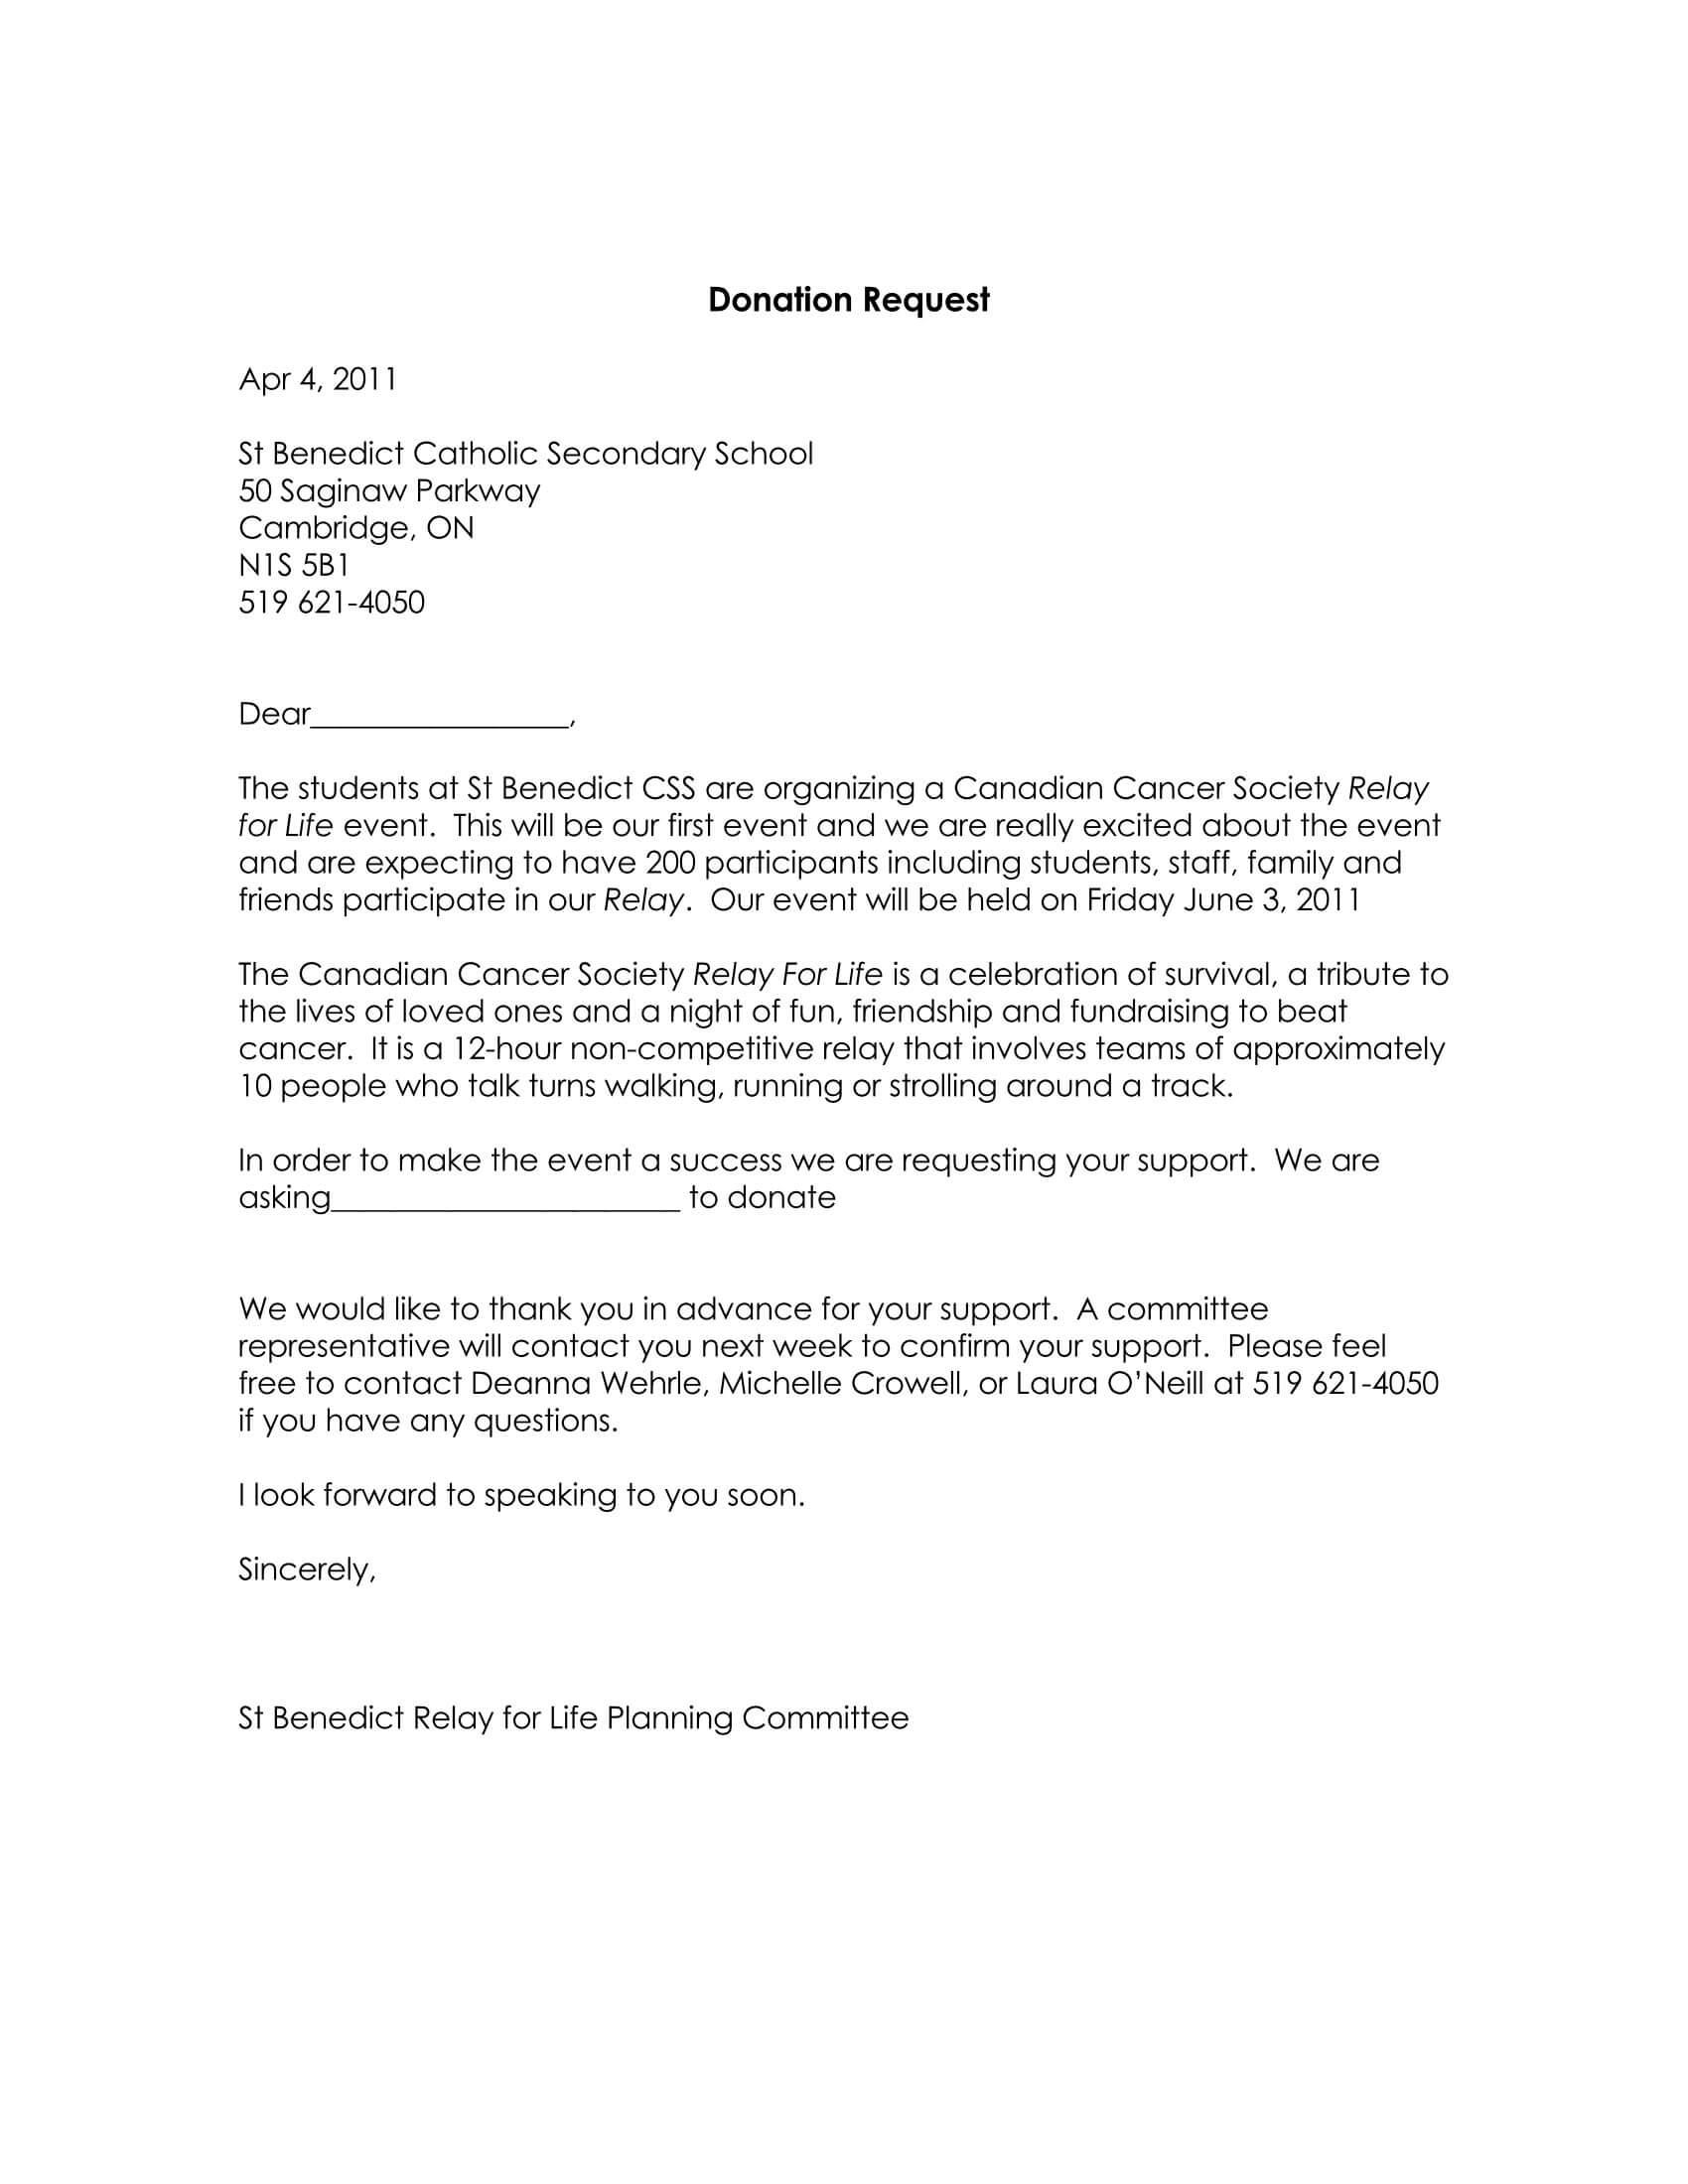 Donation Request Letter 08